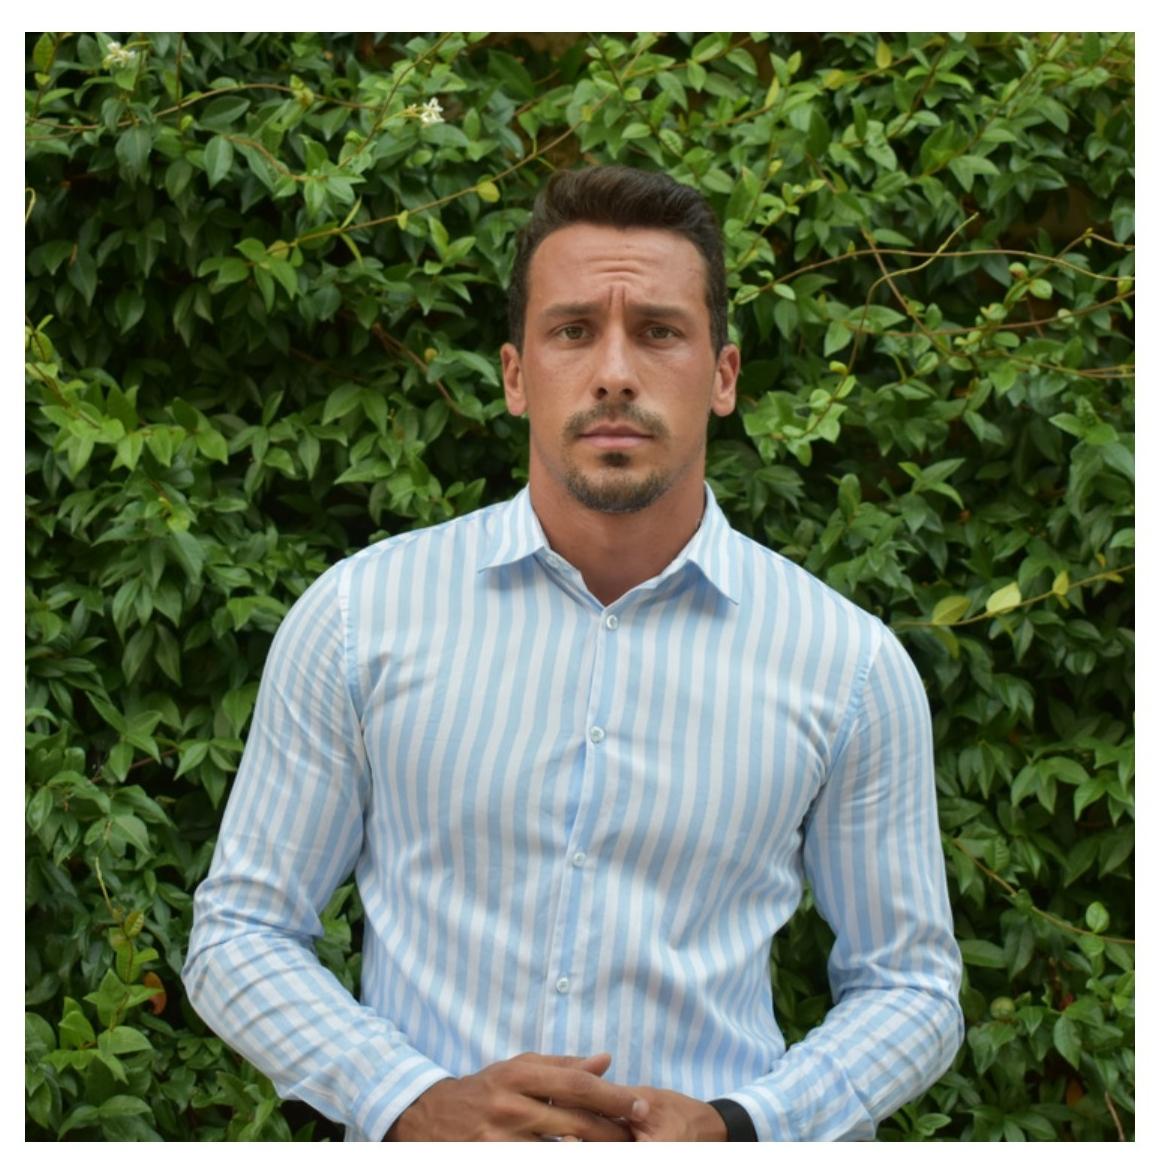 Matteo Di Bennardo - Founder and Director